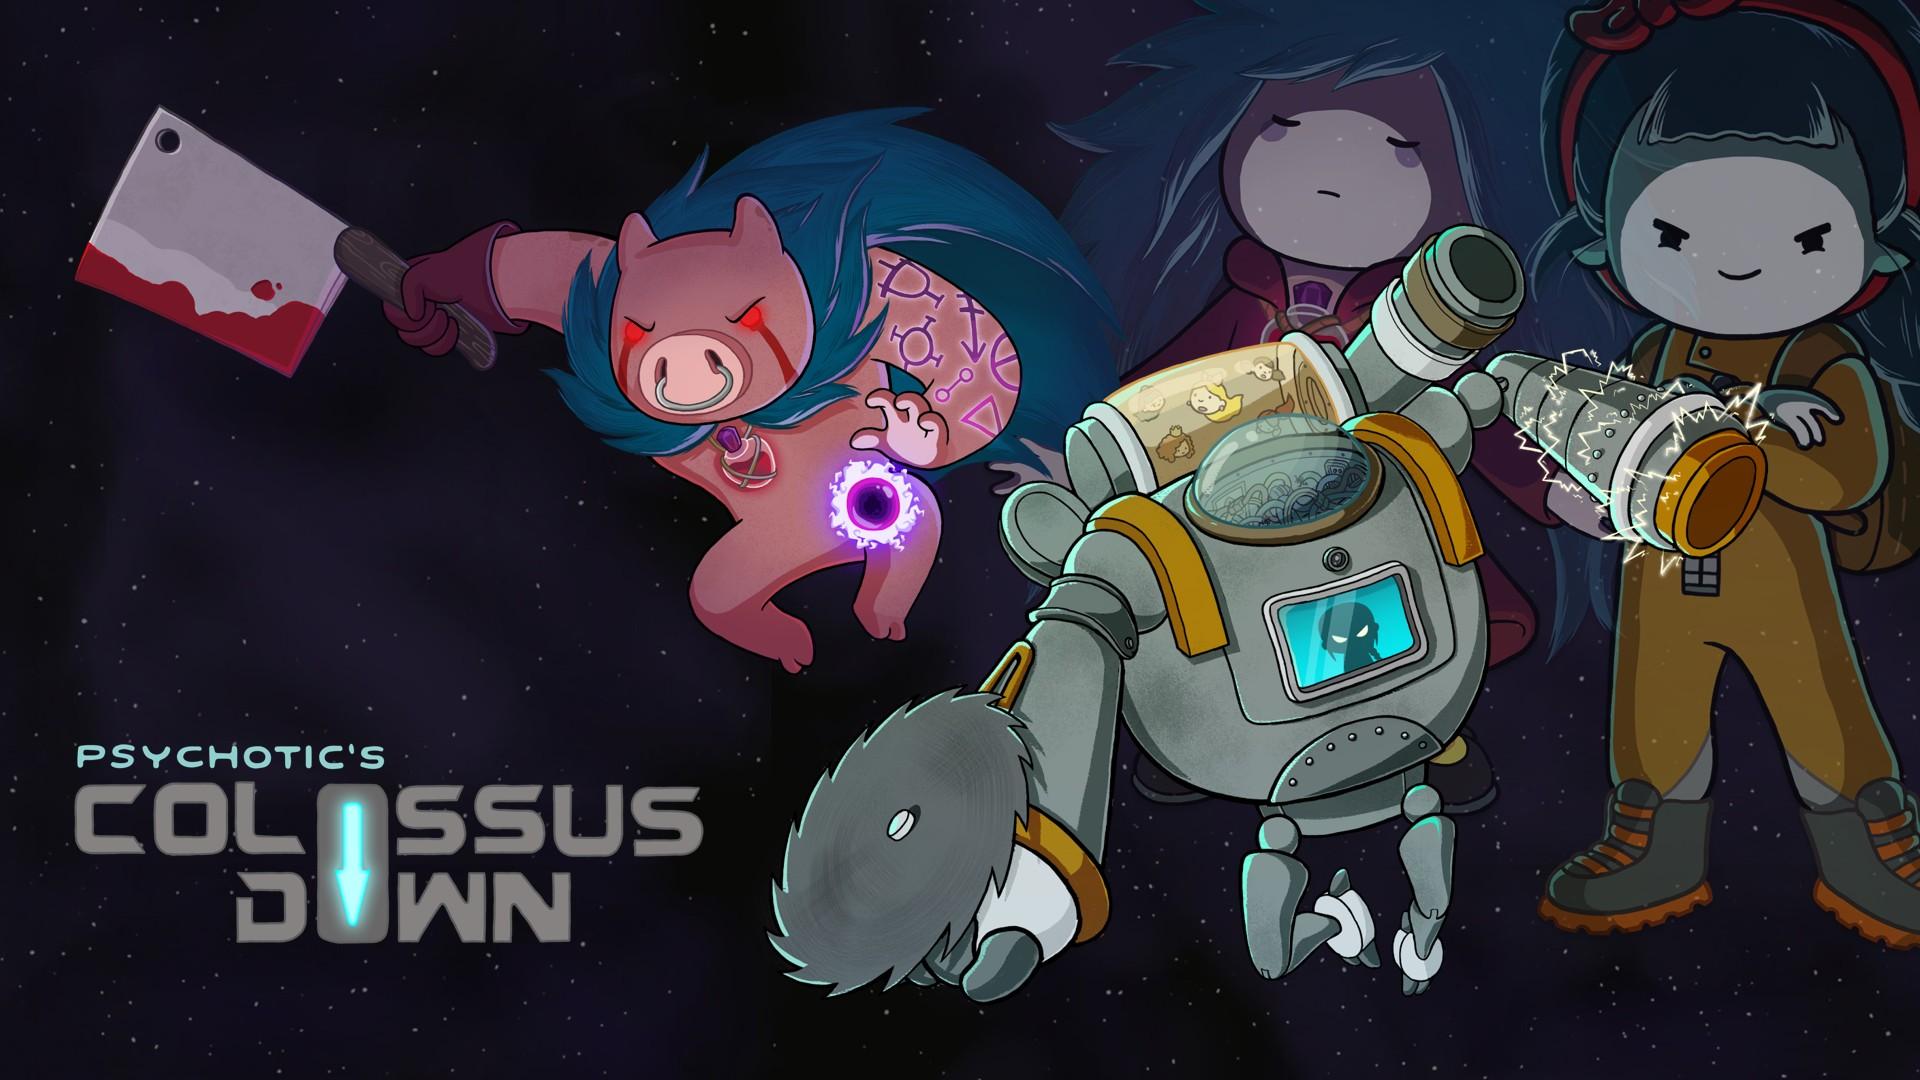 colossus_down